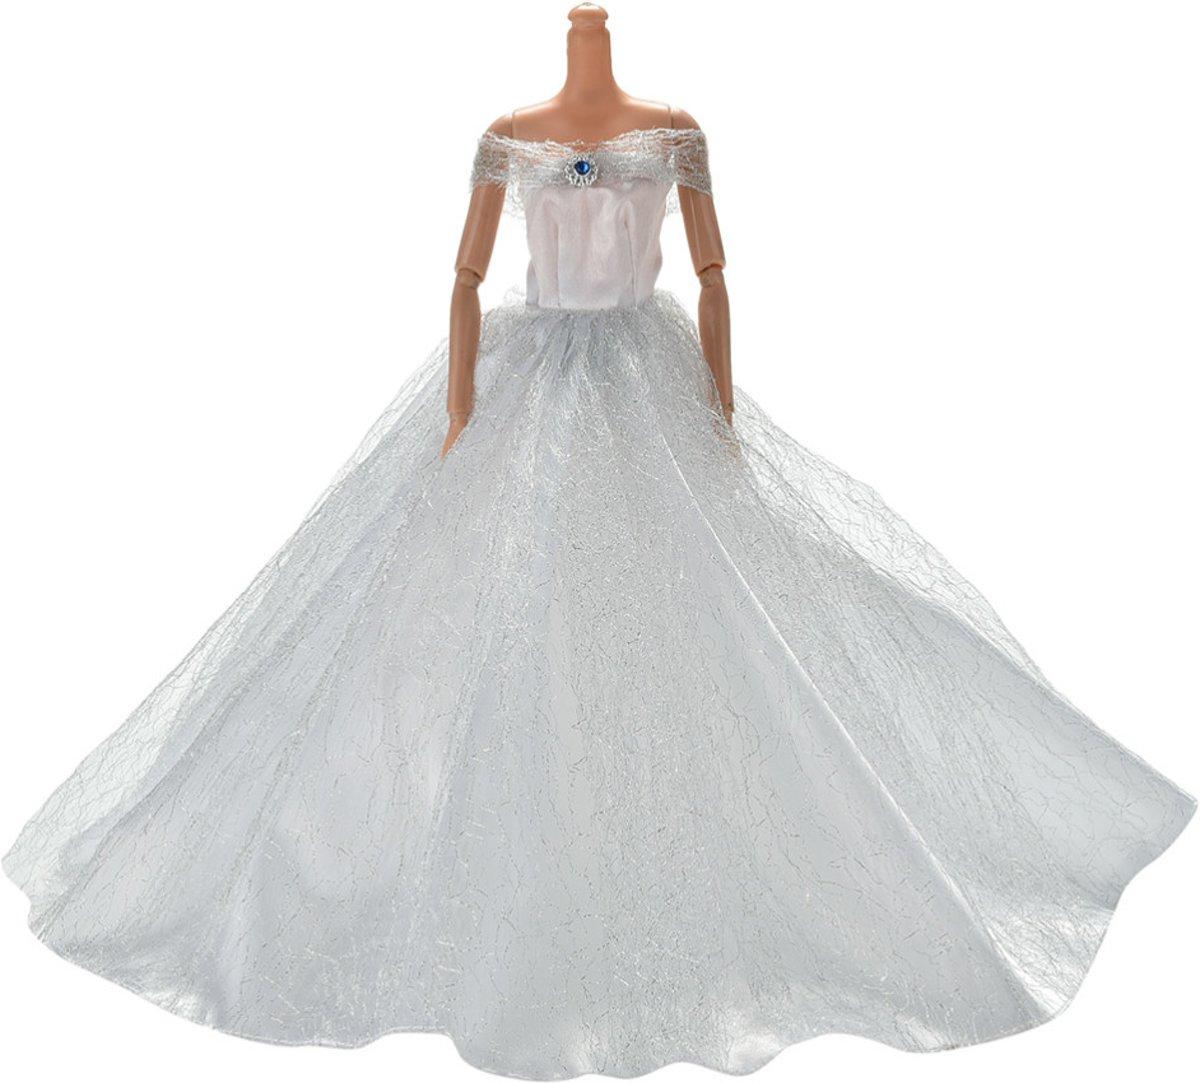 B-Merk Barbie trouwjurk, prinsessenjurk, wit, zilver